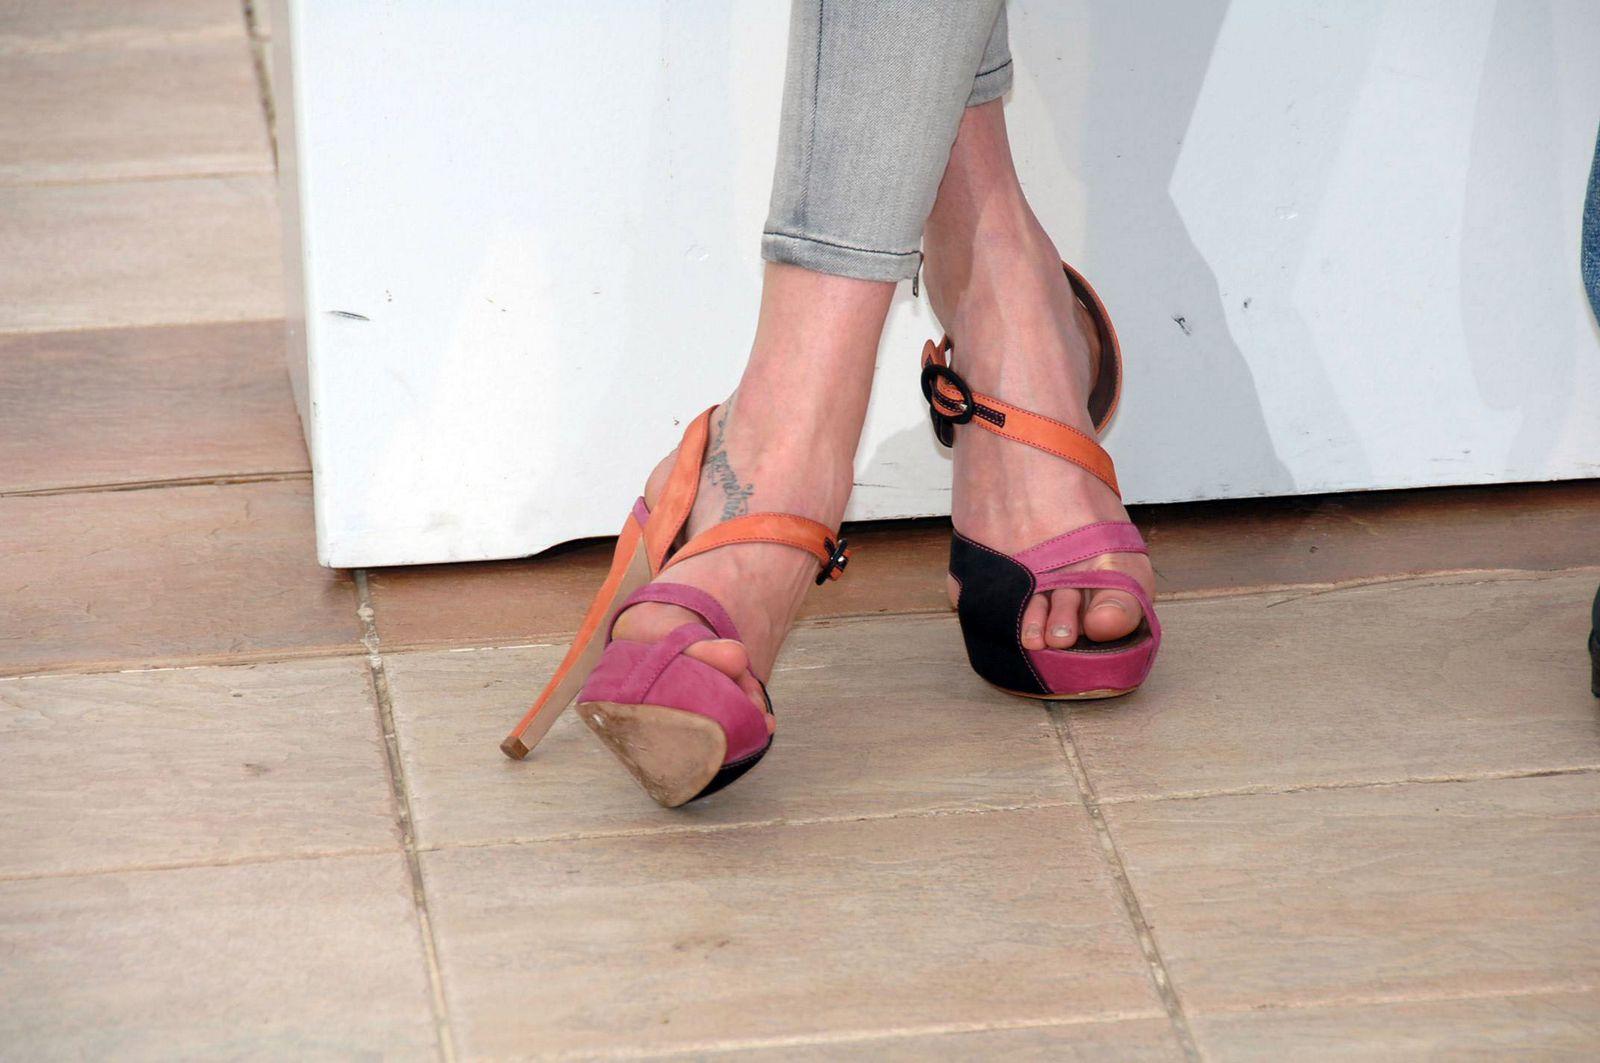 http://2.bp.blogspot.com/_hgdlBJDRZkM/TRRdC61EkdI/AAAAAAAACjc/WVjFBw6o-xY/s1600/Lily-Cole-Feet-196557.jpg